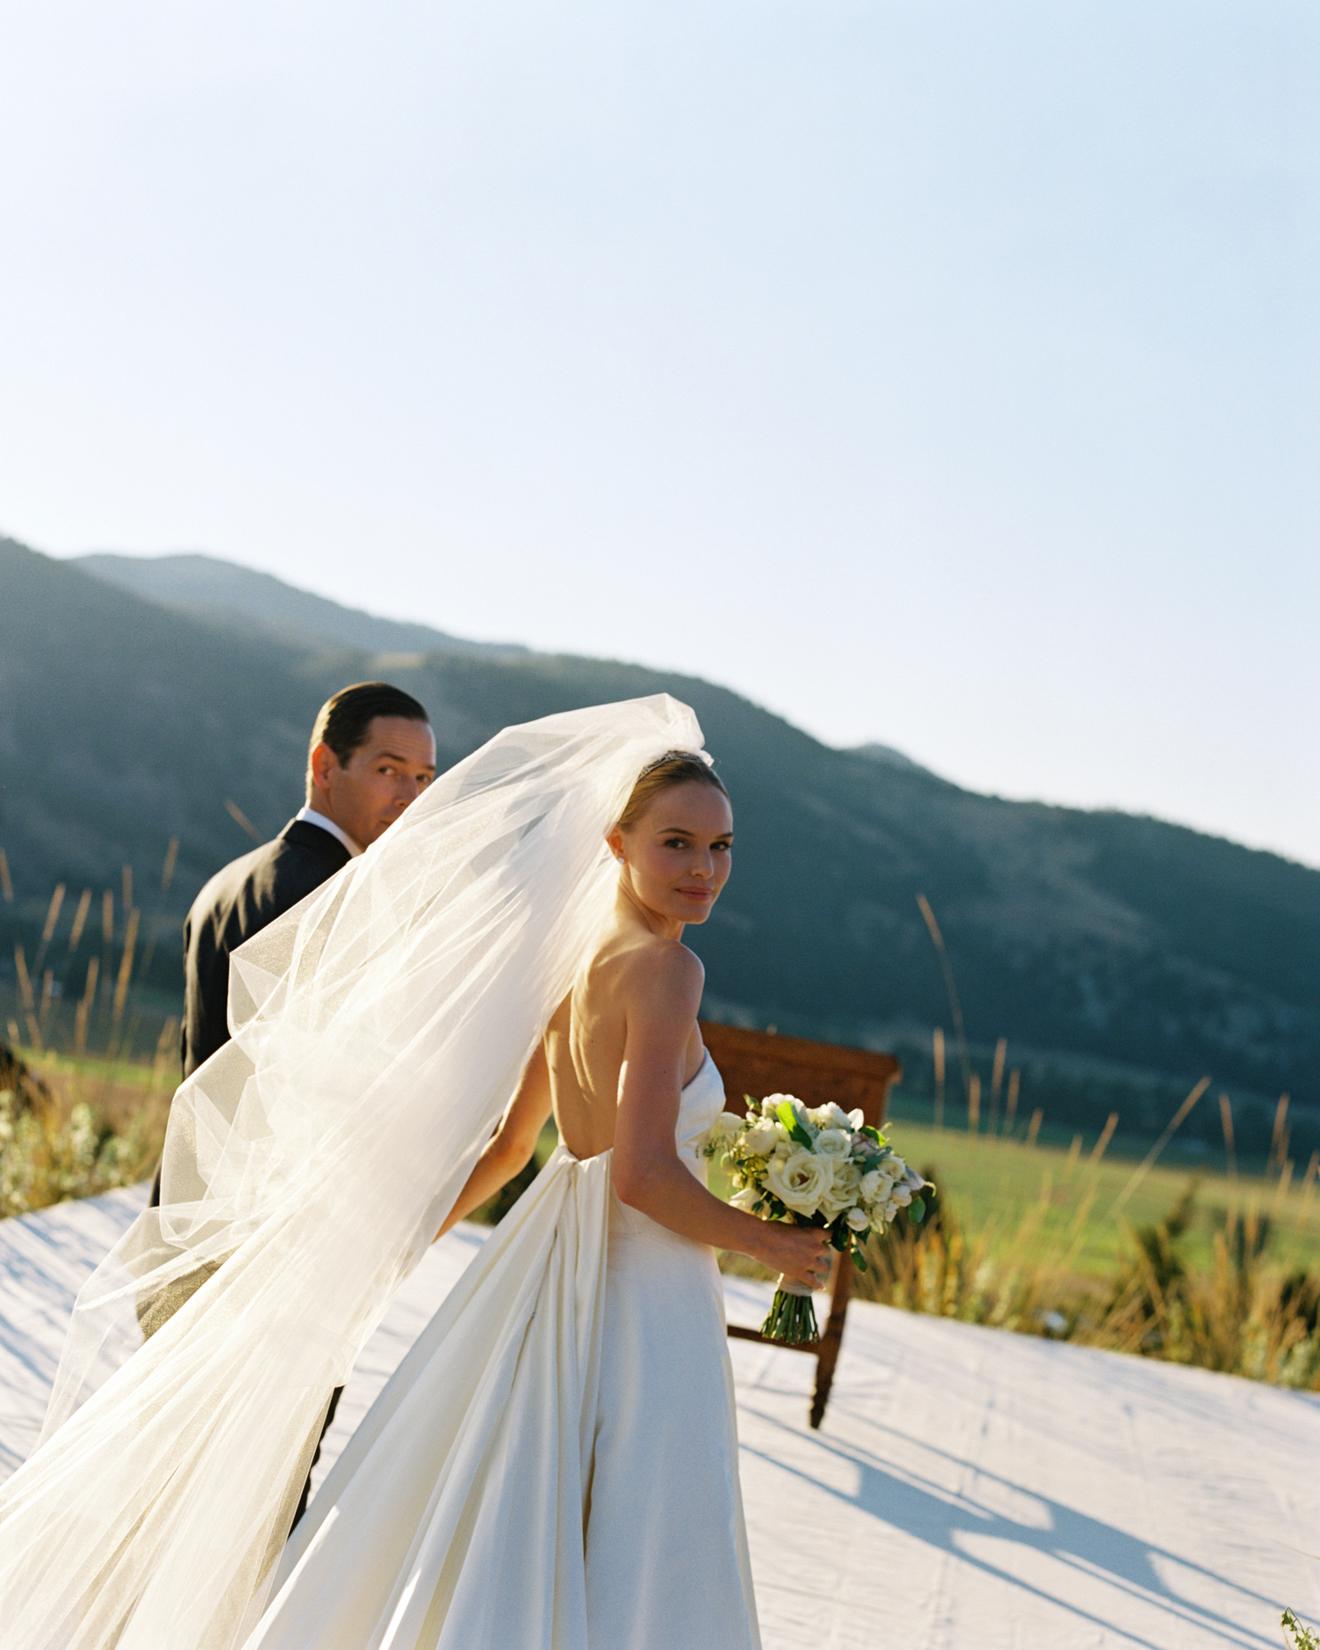 kate-bosworth-wedding-gown-0214.jpg